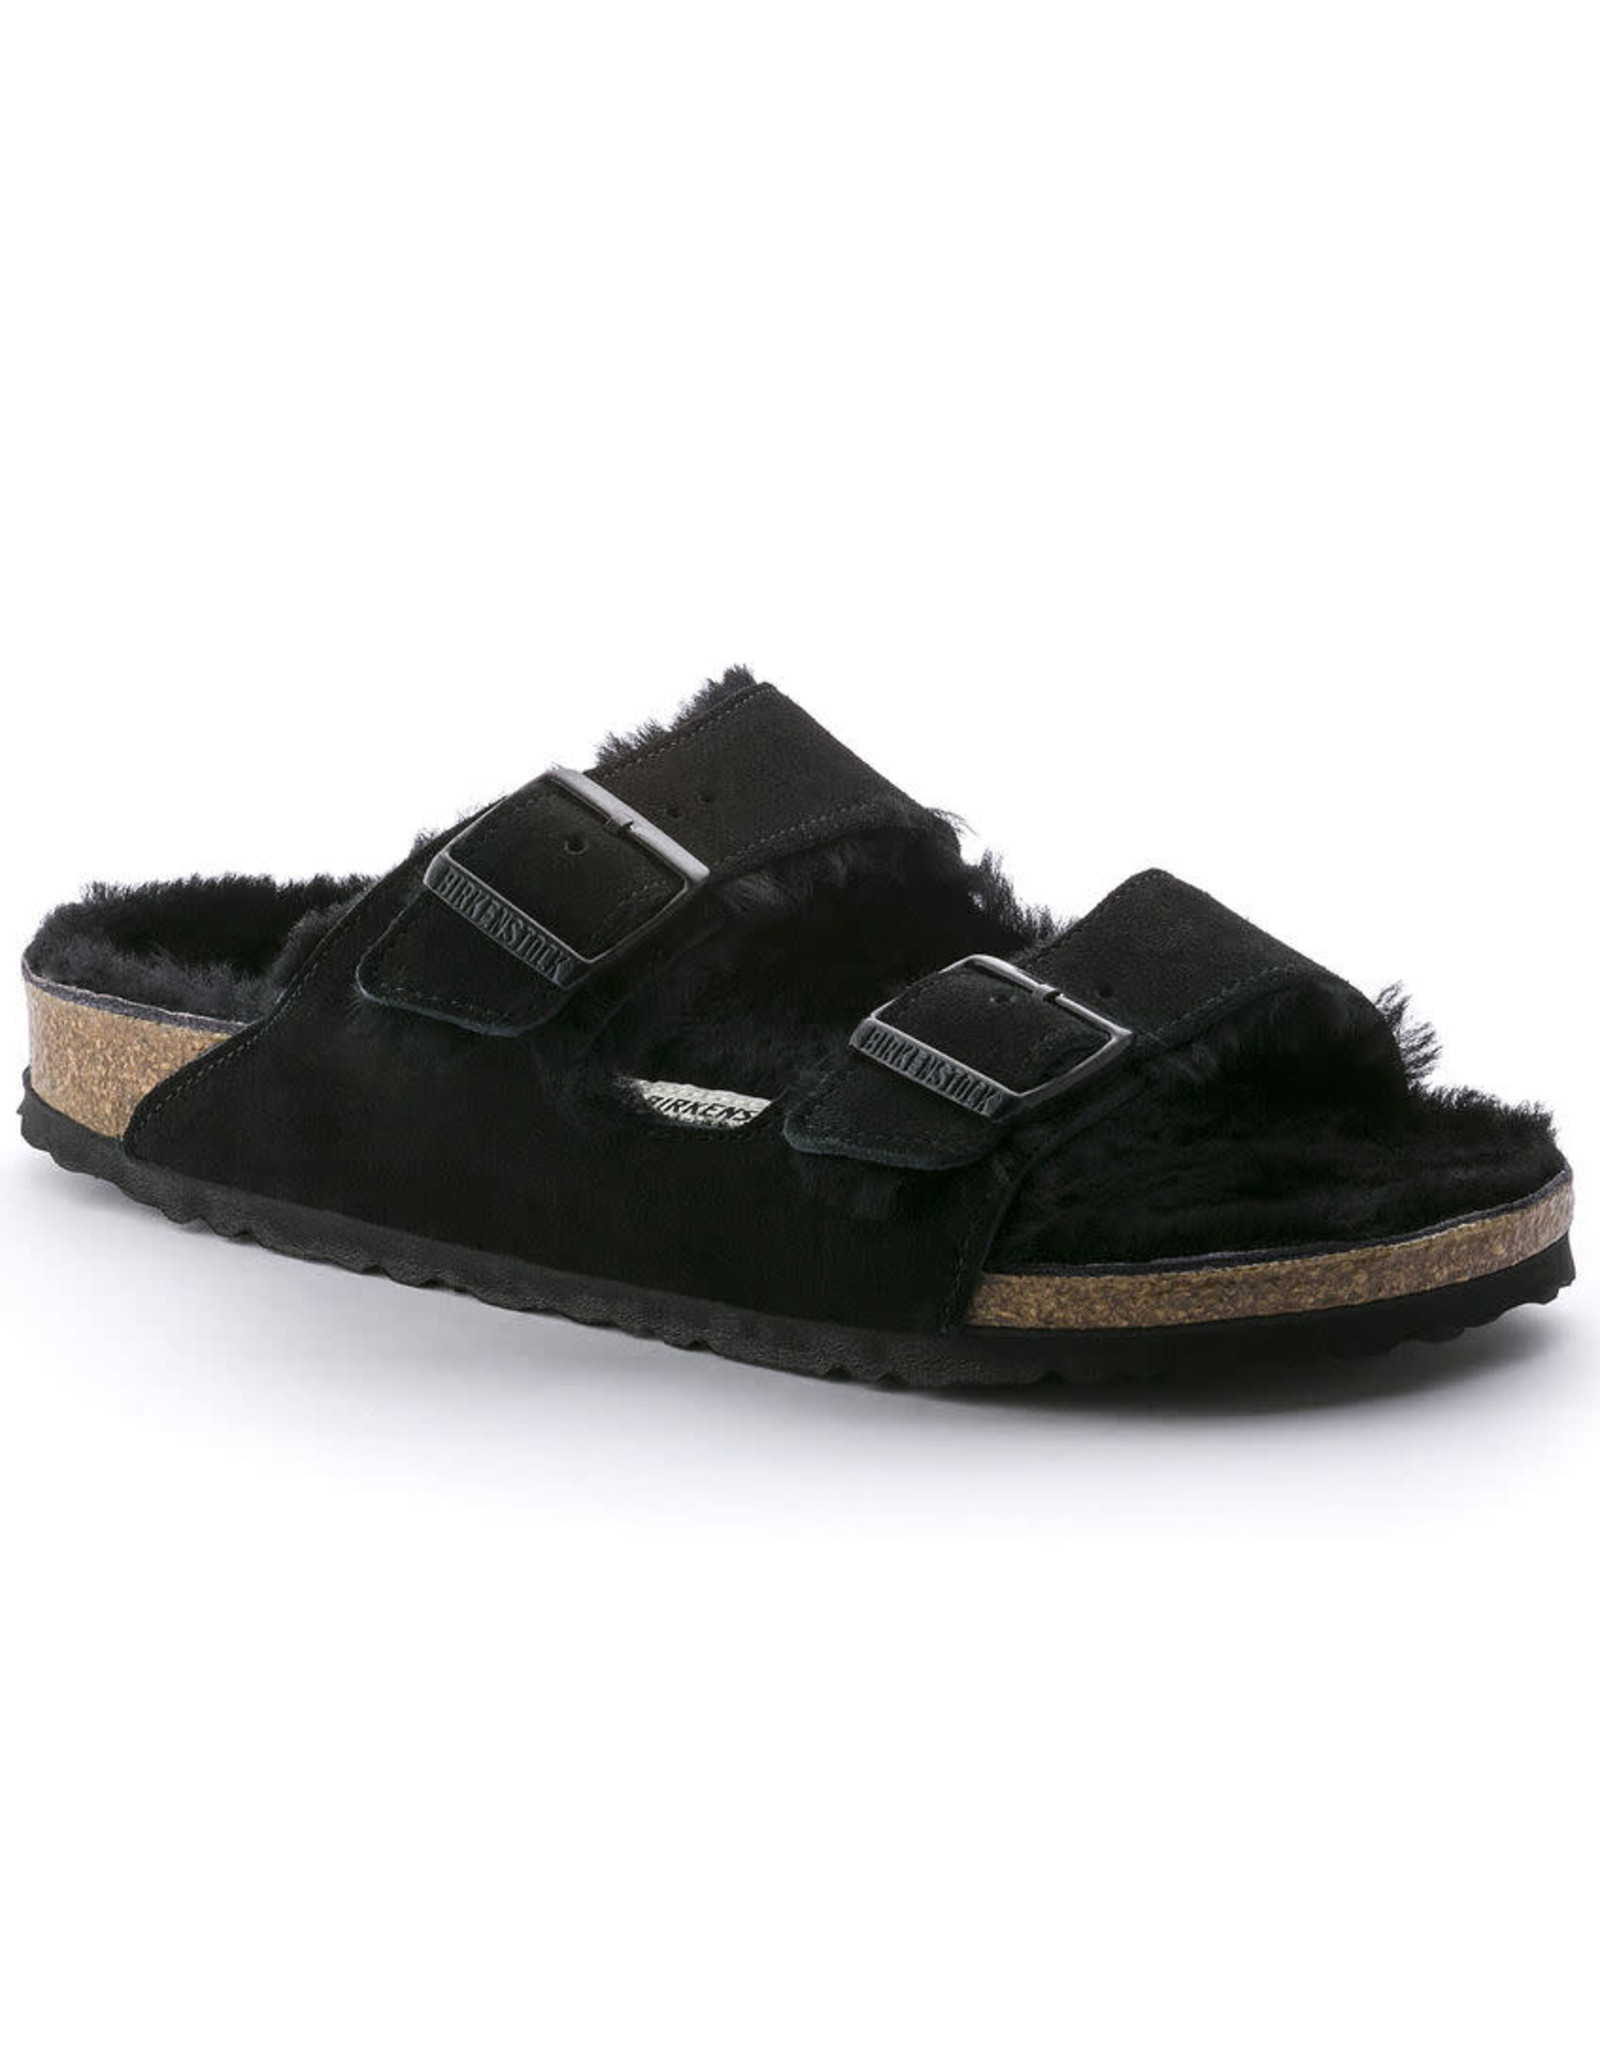 Birkenstock Arizona Suede Shearling Fur Sandal